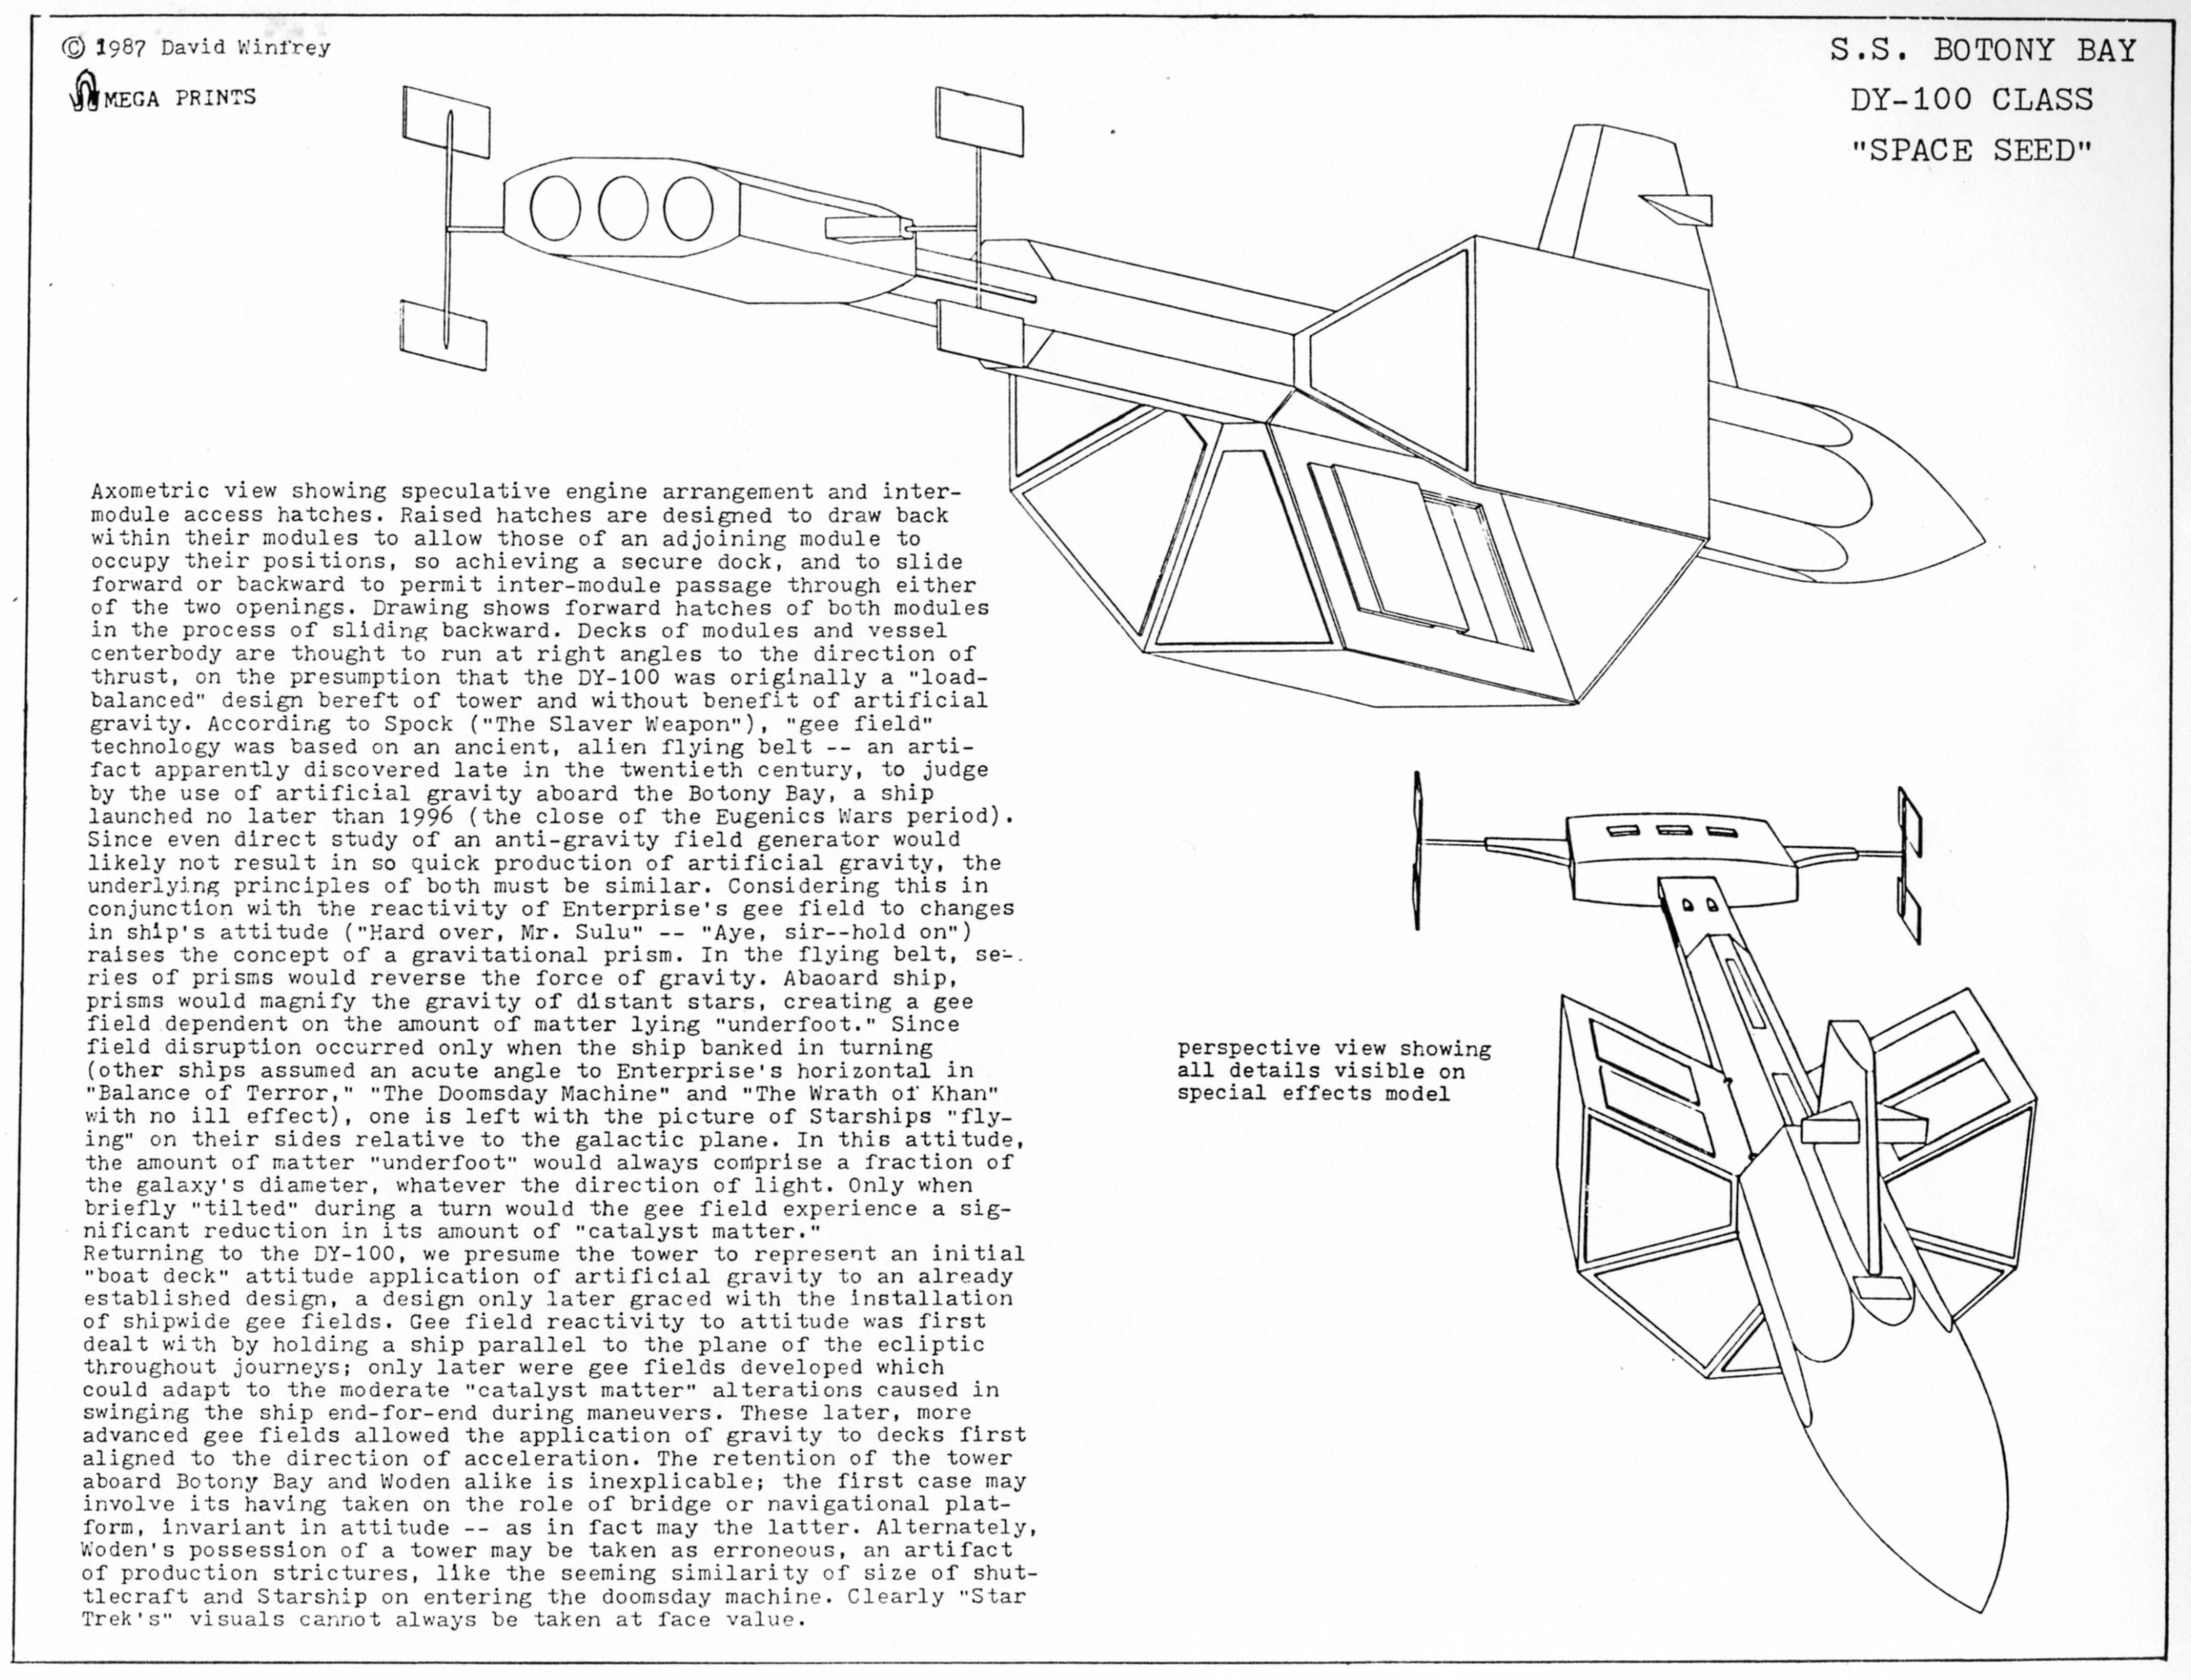 star trek modeler u0026 39 s blueprints